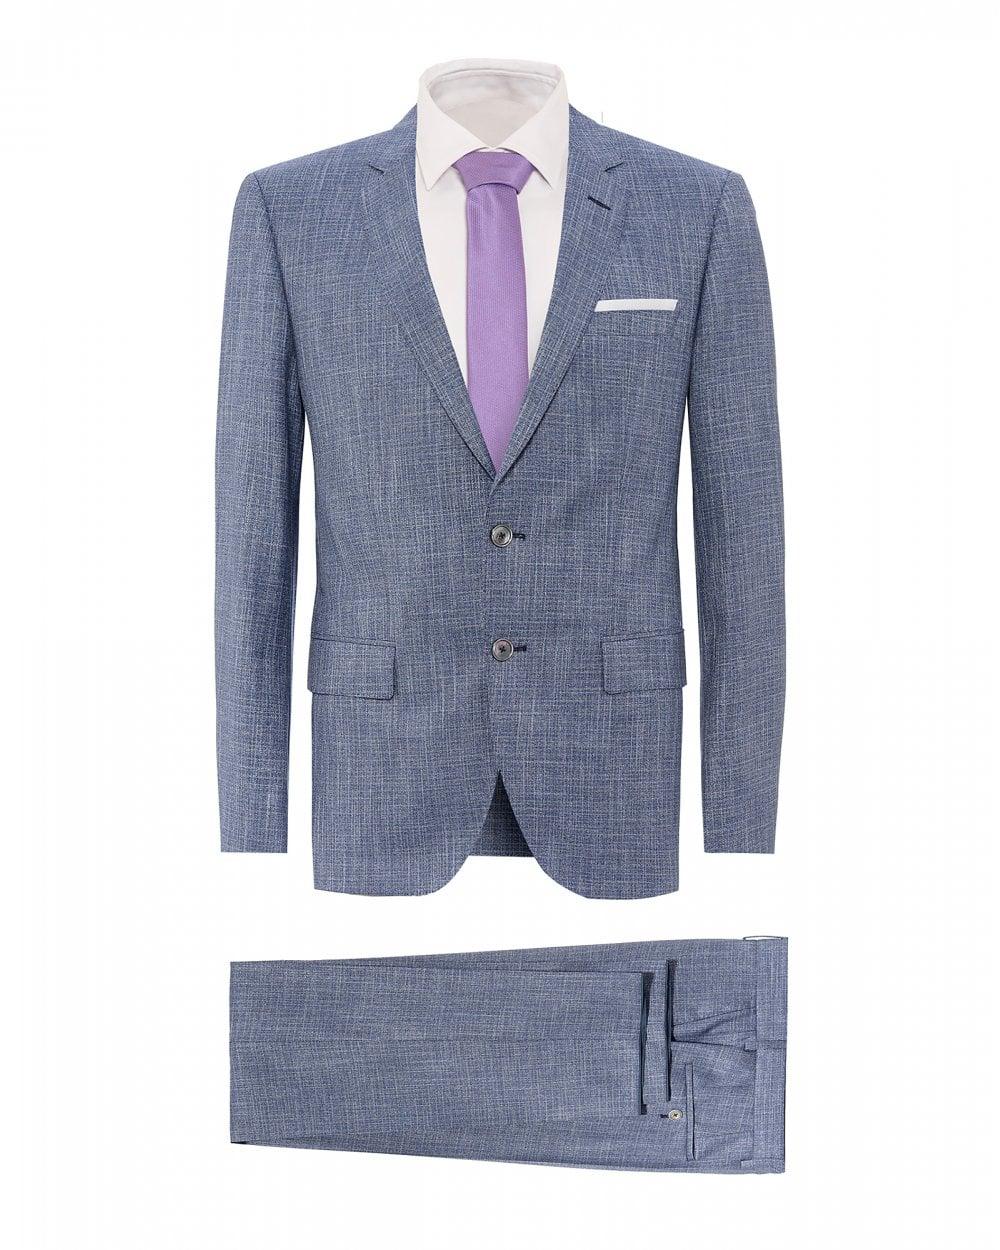 d7efb6e15 BOSS Mens Hutson5/Gander3 Blue Melange Slim Fit Sheen Suit